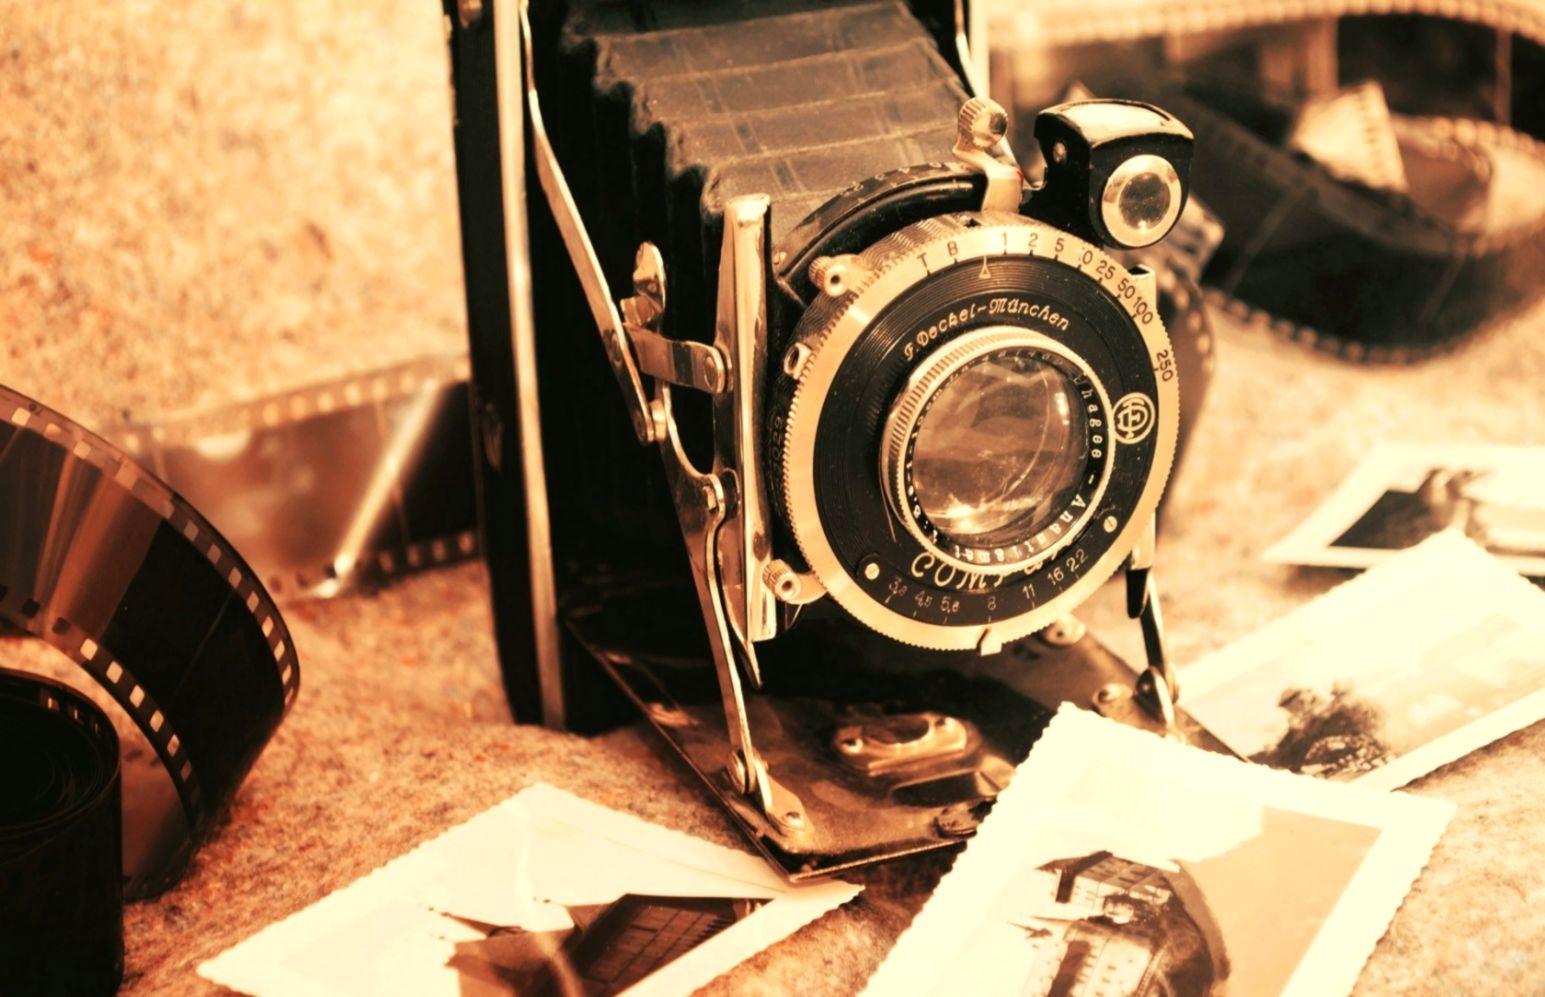 Unduh 44 Background Camera Tumblr Gratis Terbaru